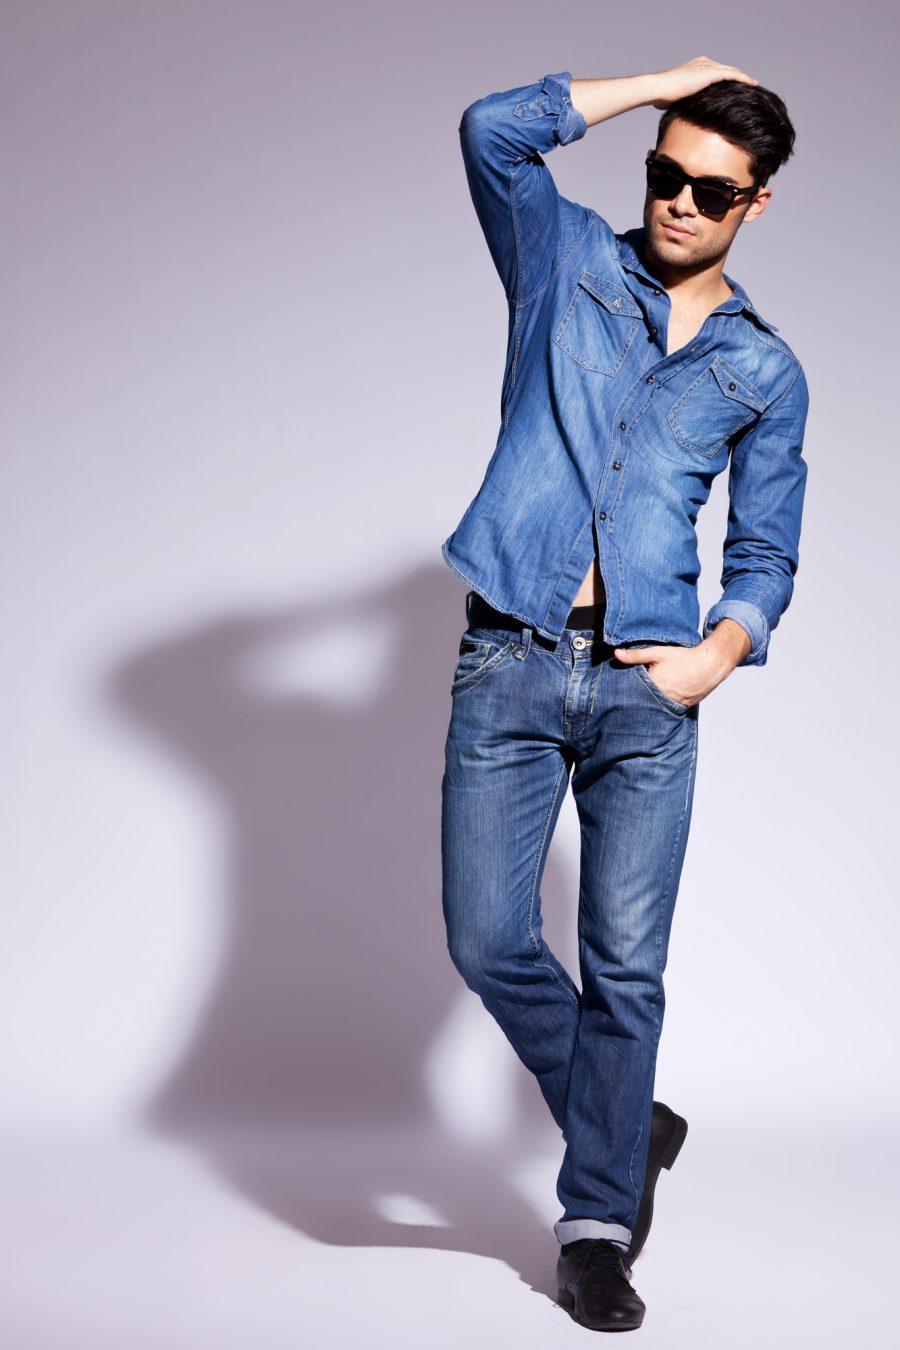 Latin Male Model Double Denim Style